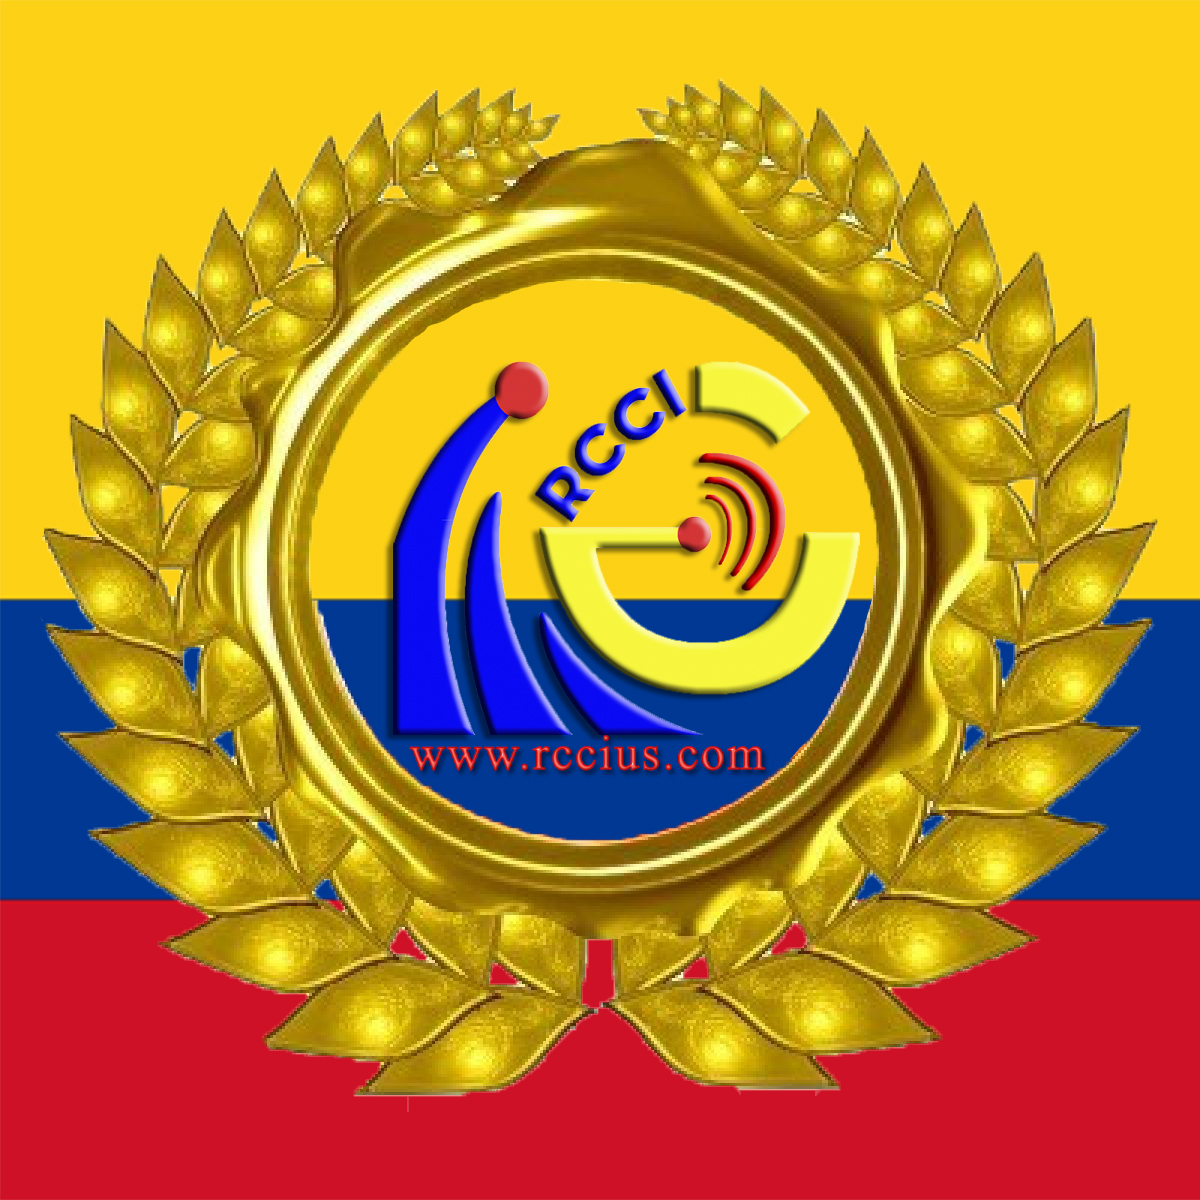 RCCI US